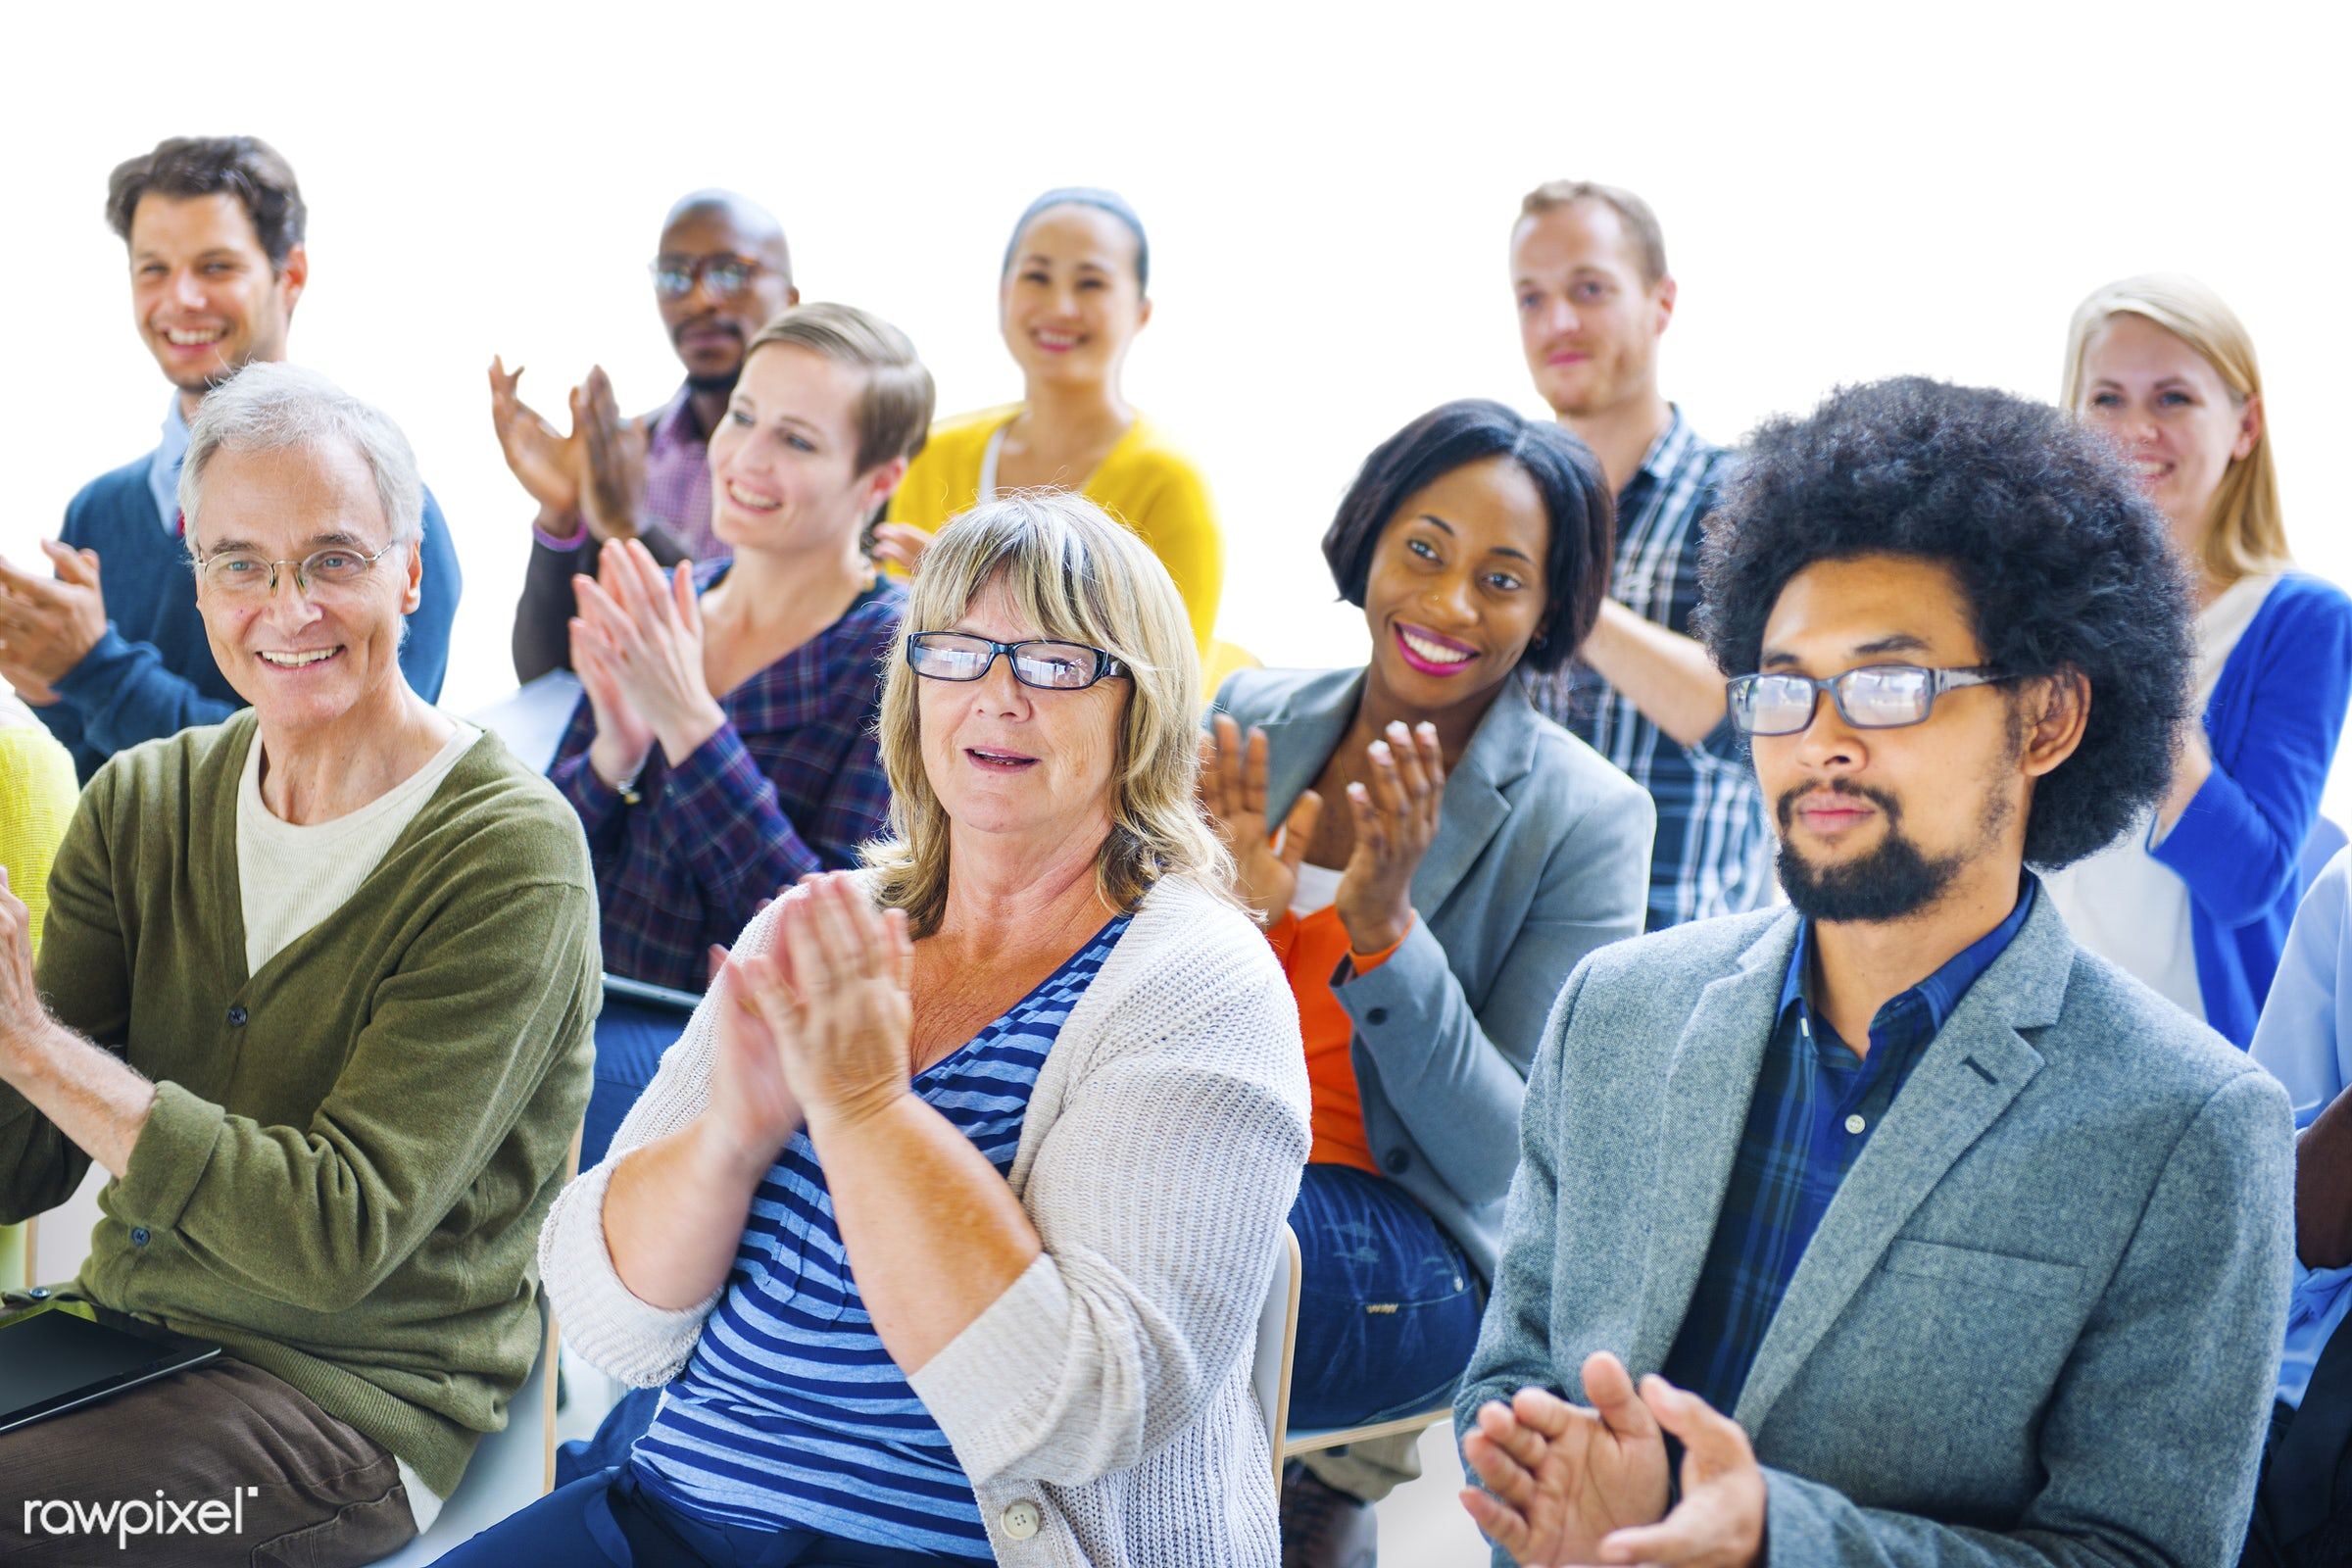 applauding, congratulating, achievement, african descent, applause, appreciation, asian ethnicity, audience, business people...